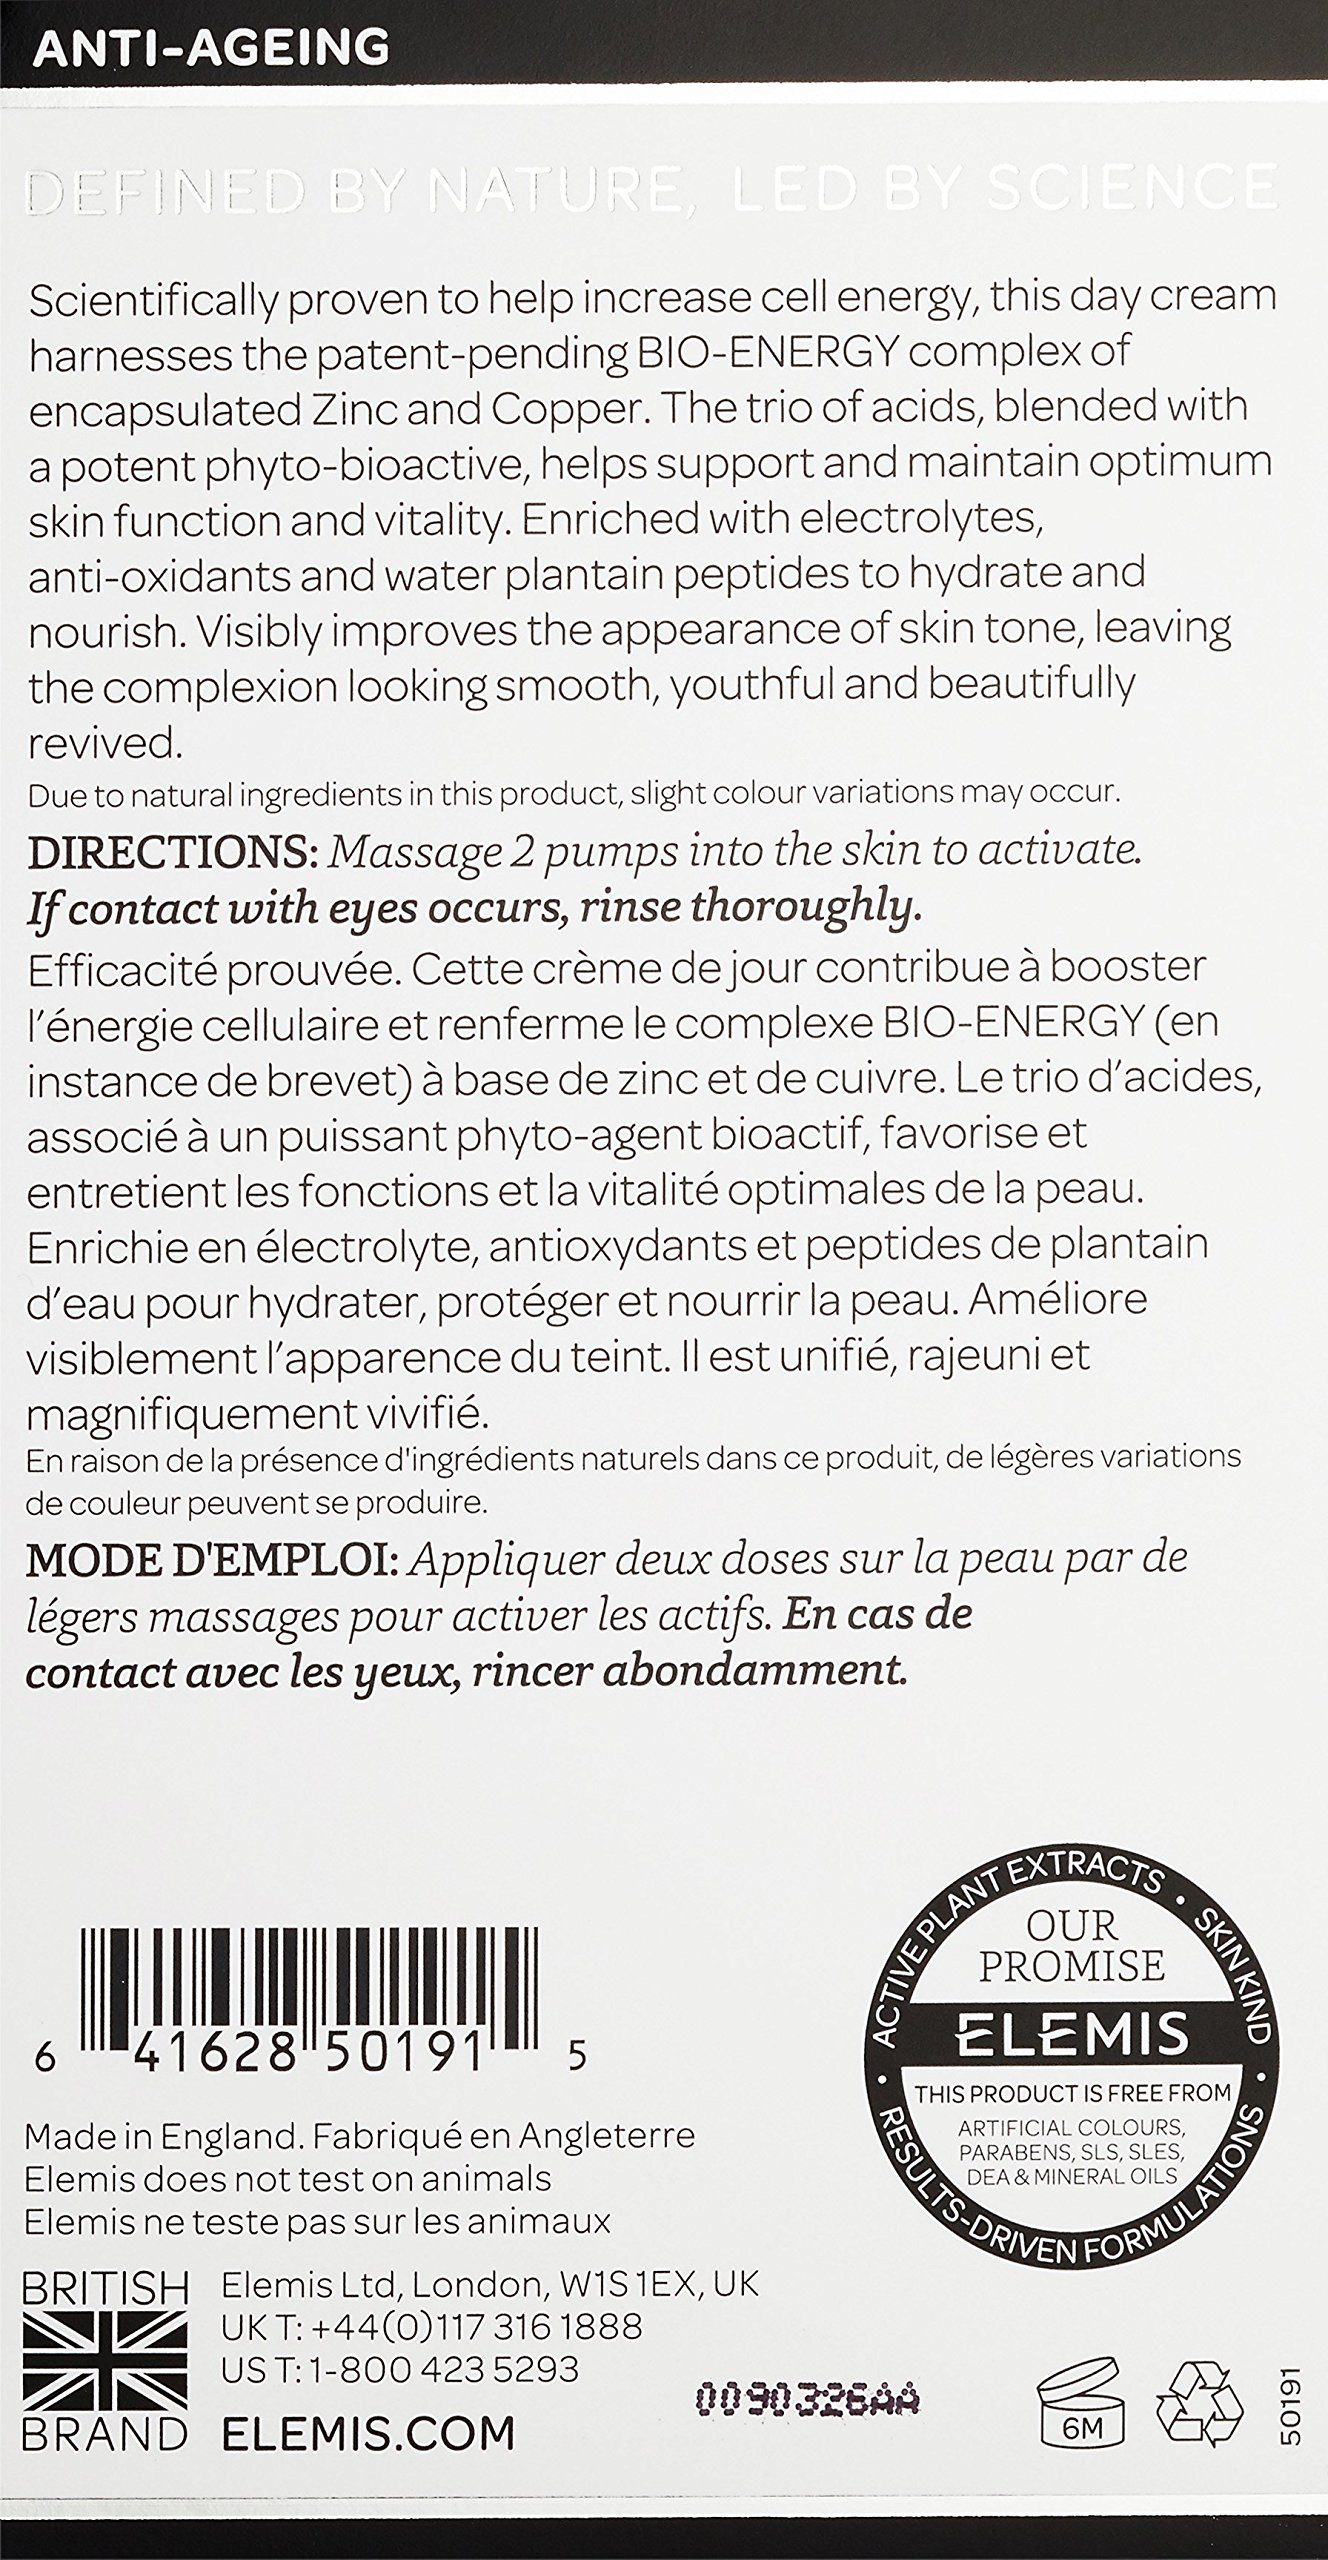 ELEMIS BIOTEC Skin Energizing Day Cream, Skin Activating Moisturizer for Normal Skin, 1 fl. oz. by ELEMIS (Image #2)